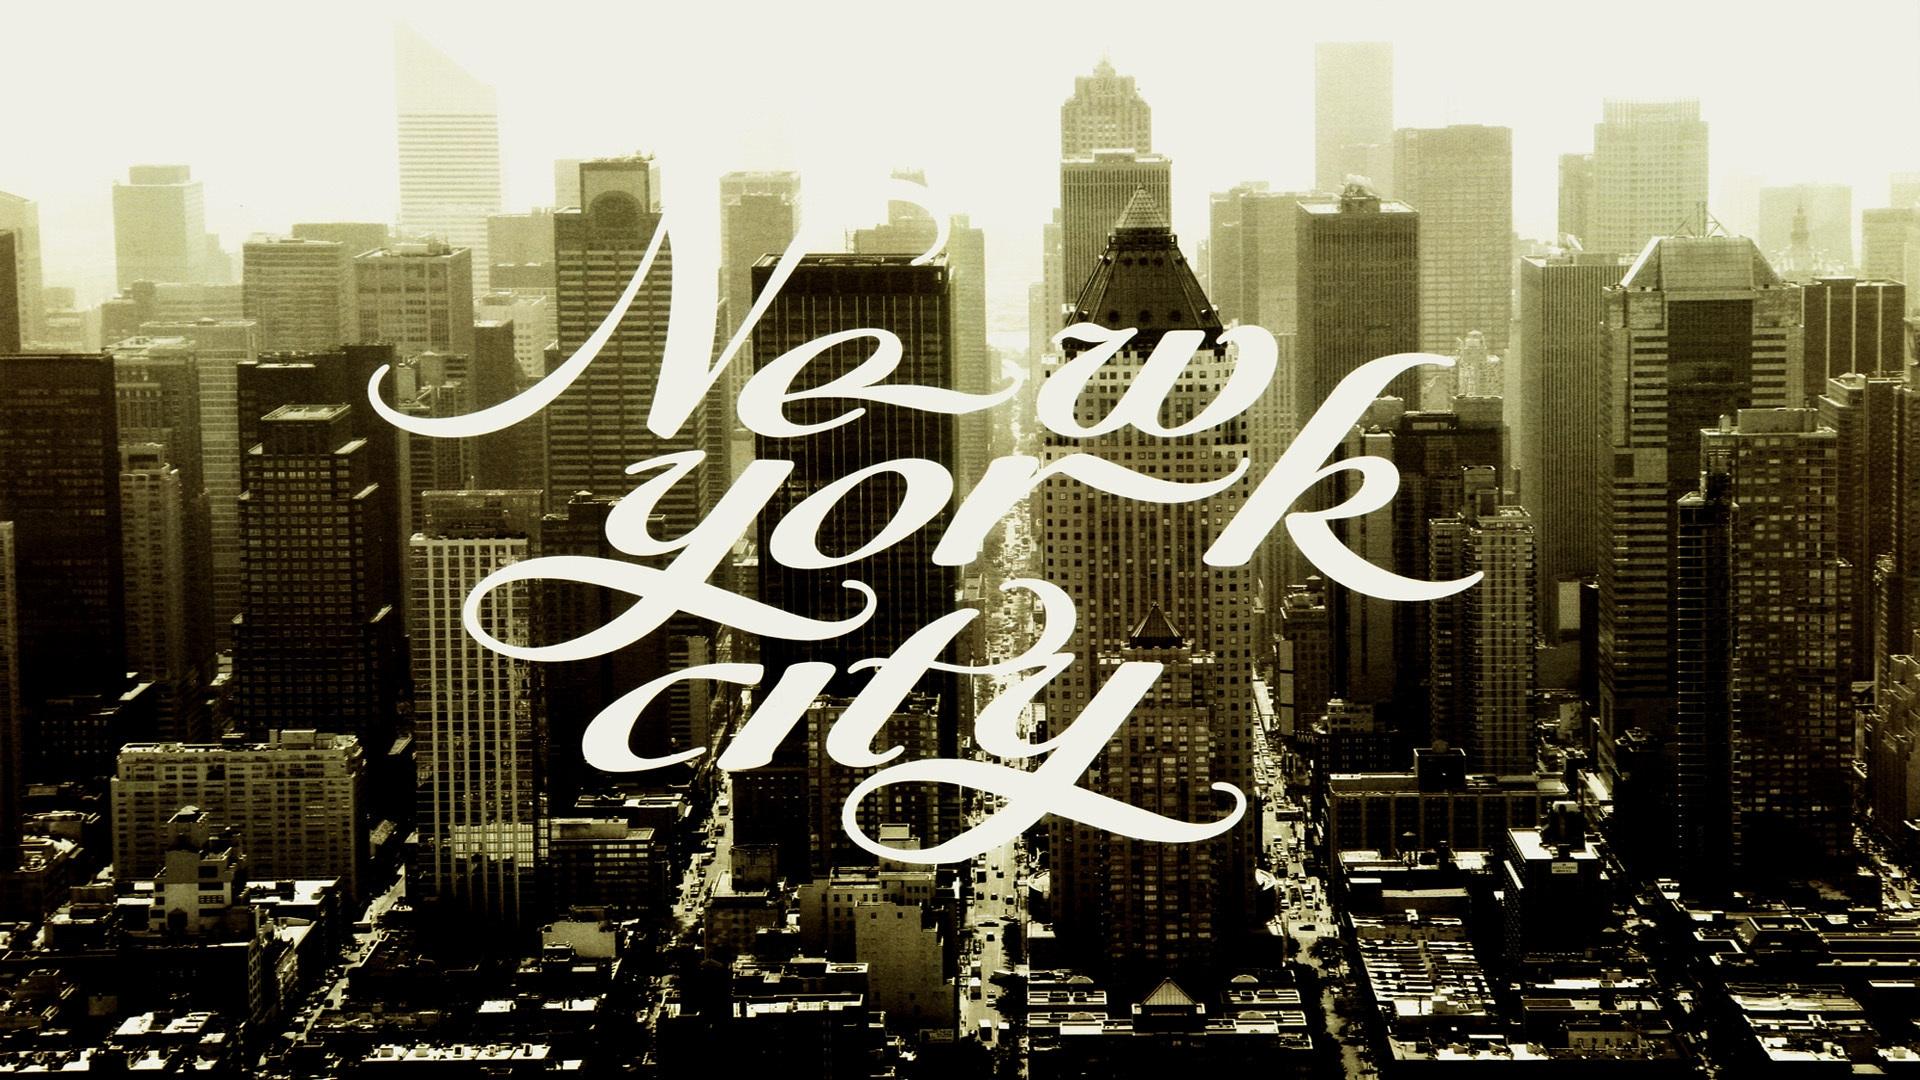 Download wallpaper 1920x1080 sign retro new york full hd 1080p hd background - Wallpaper 1080p new york ...